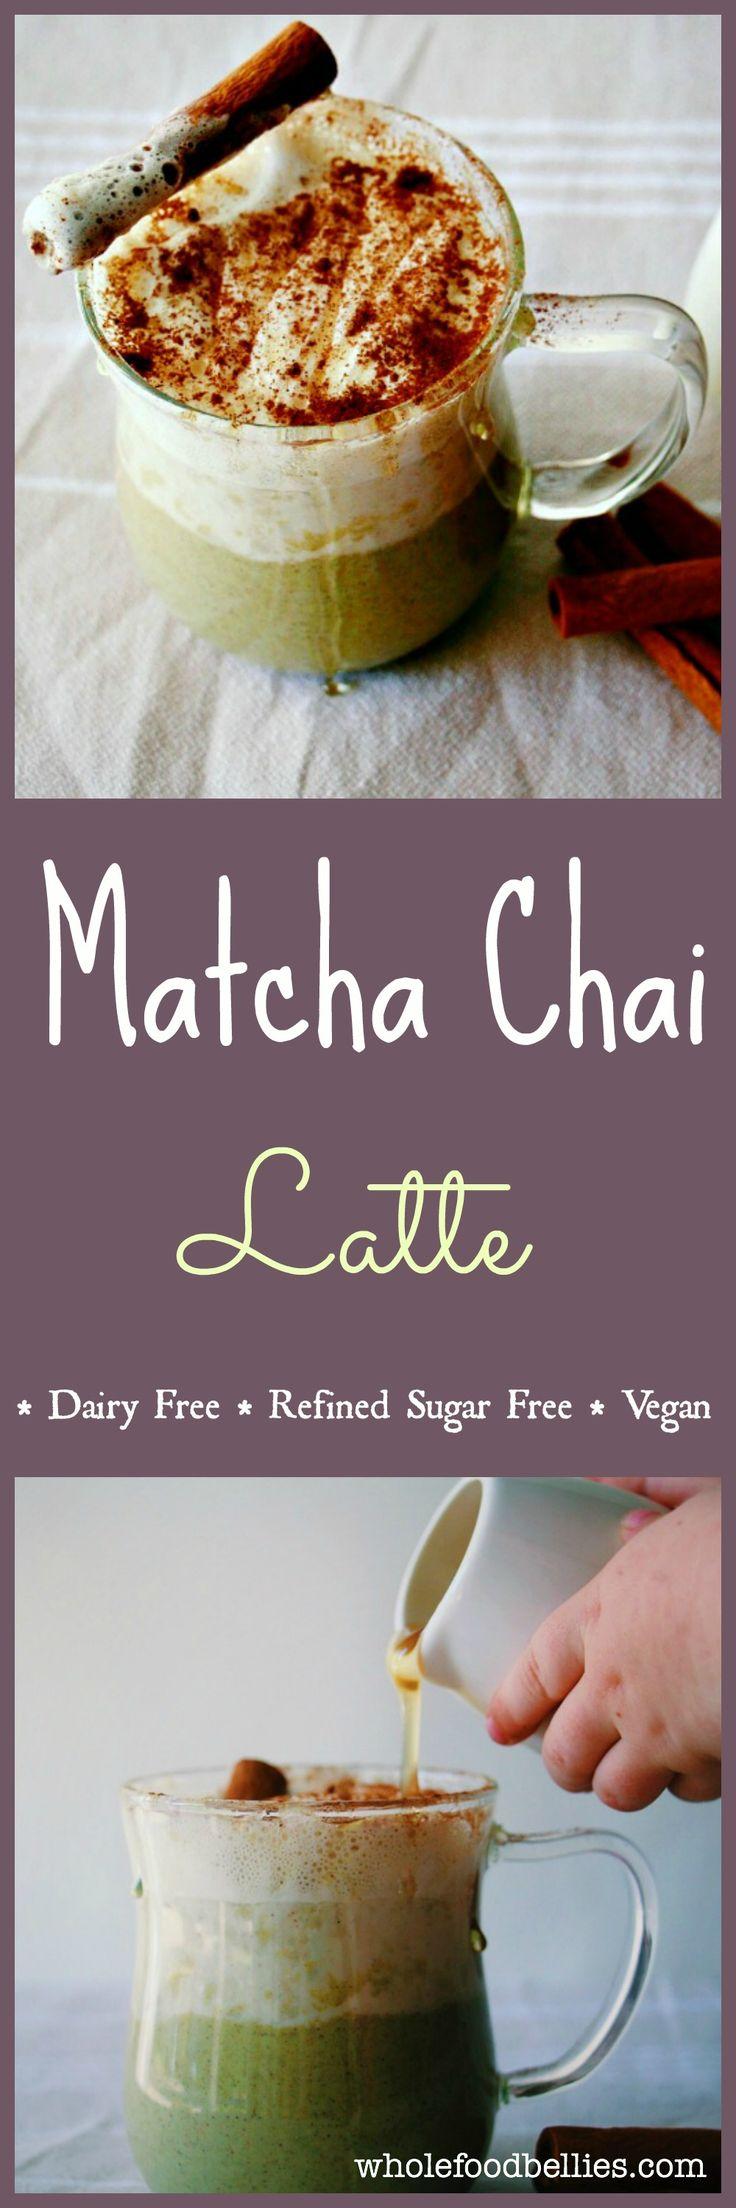 Green Tea Chai Spiced Latte. No refined sugar, dairy free, vegan, clean eating #matcha #vegan #drink #chai